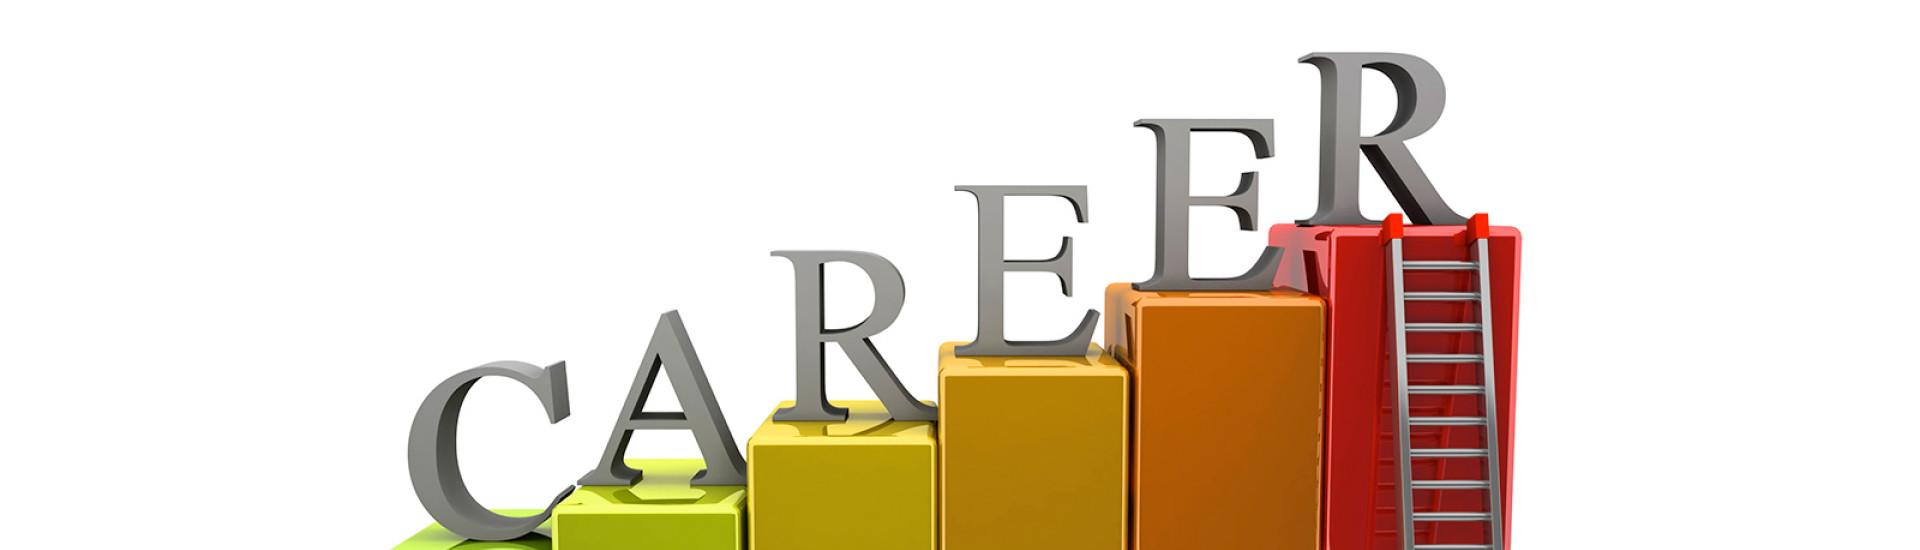 Careers الوظائف